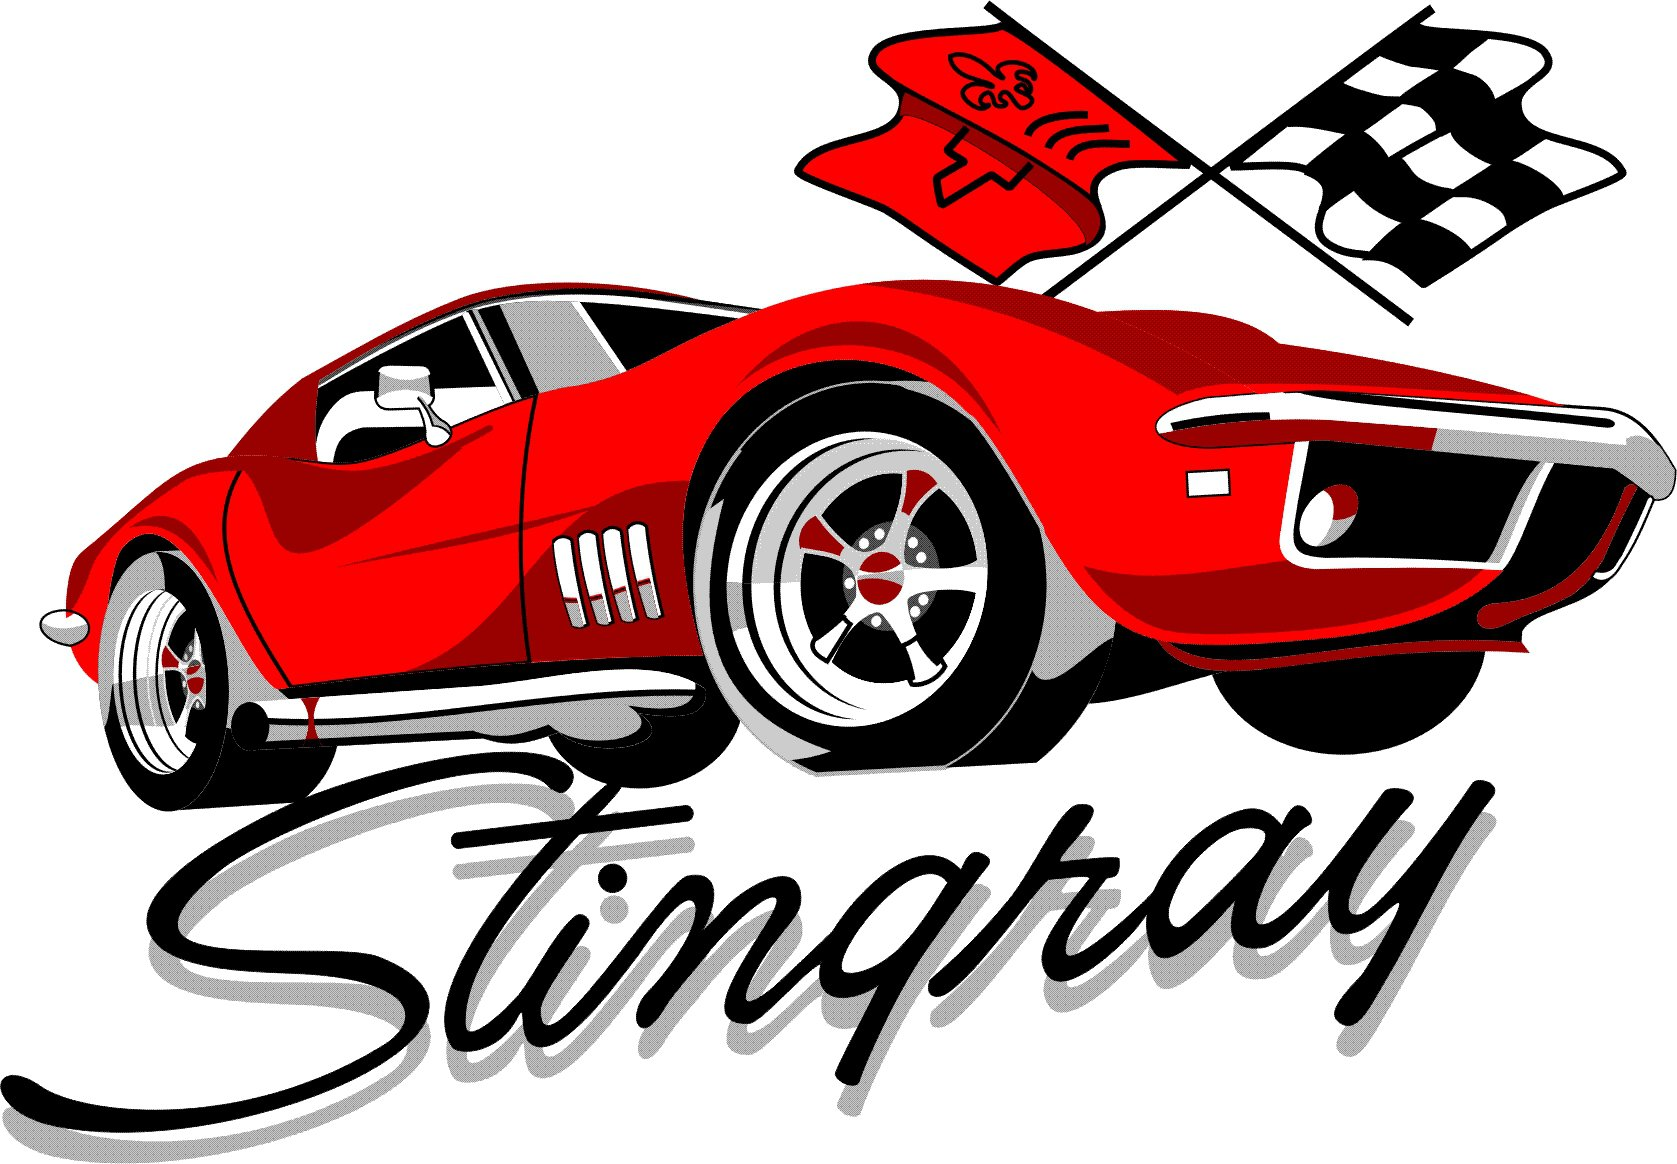 corvette stingray clipart at getdrawings com free for personal use rh getdrawings com corvette clipart vector corvette clip art silhouette